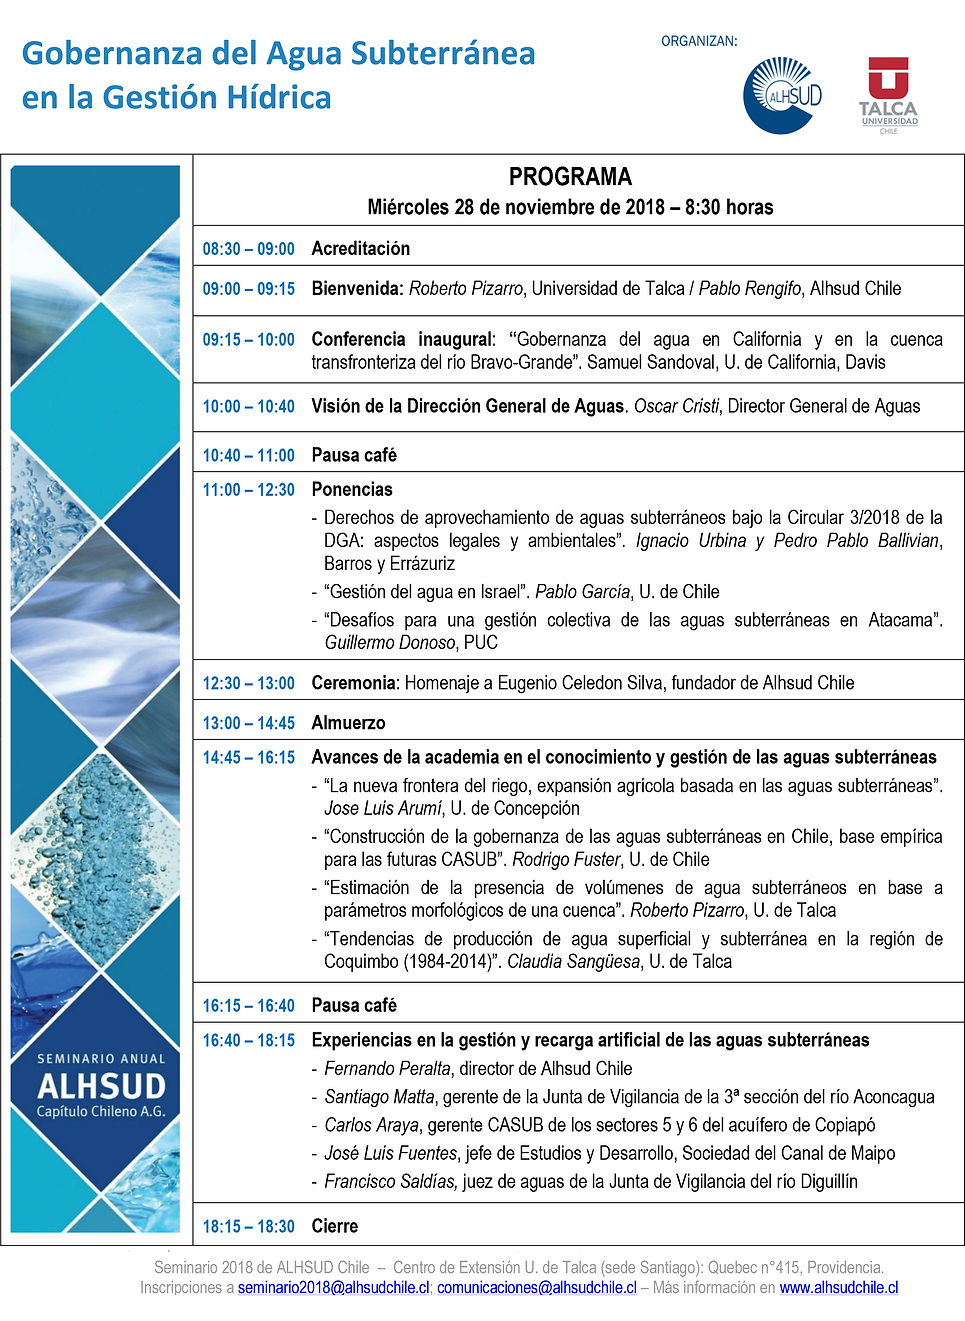 PROGRAMA_SeminarioAlhsud2018_v4.png